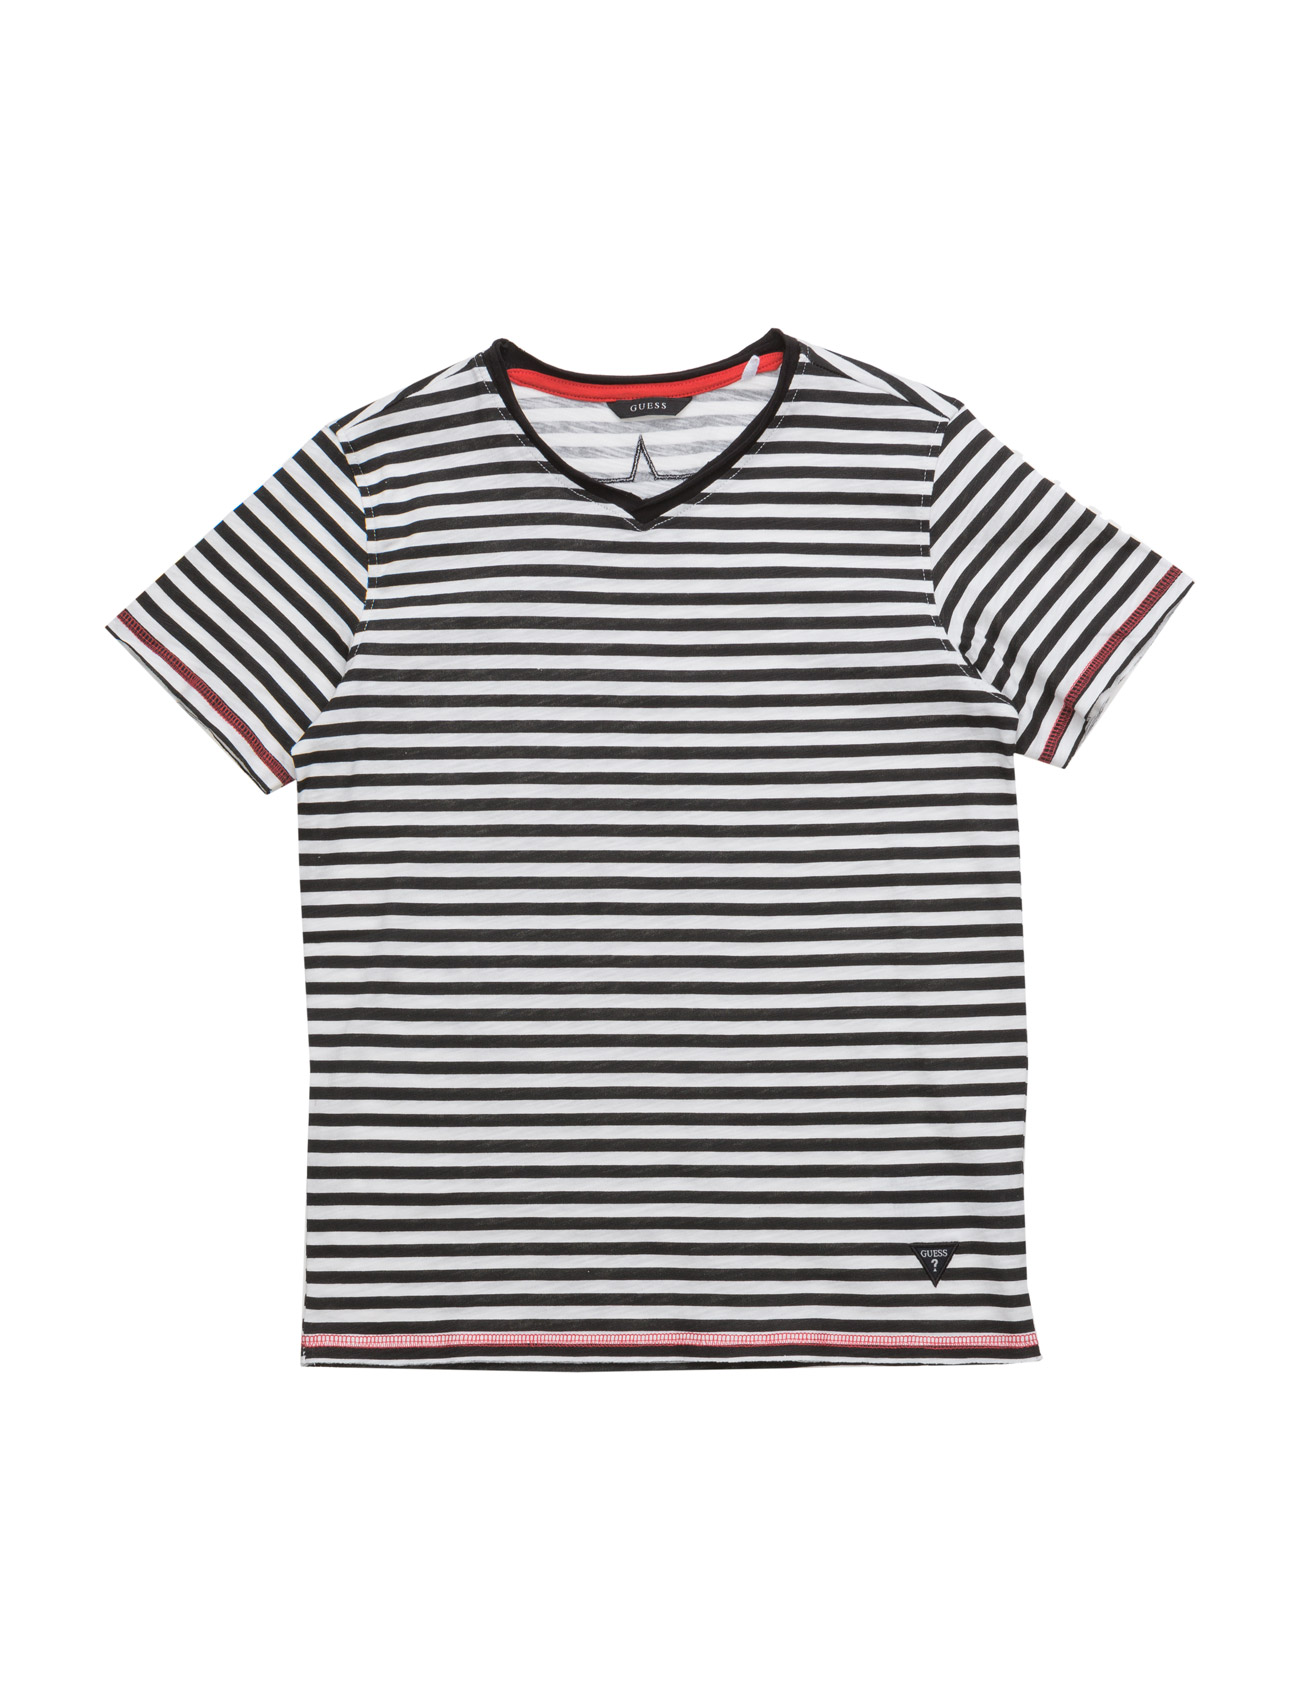 Ss Malfile T-Shirt GUESS Kortærmede t-shirts til Børn i Bleu